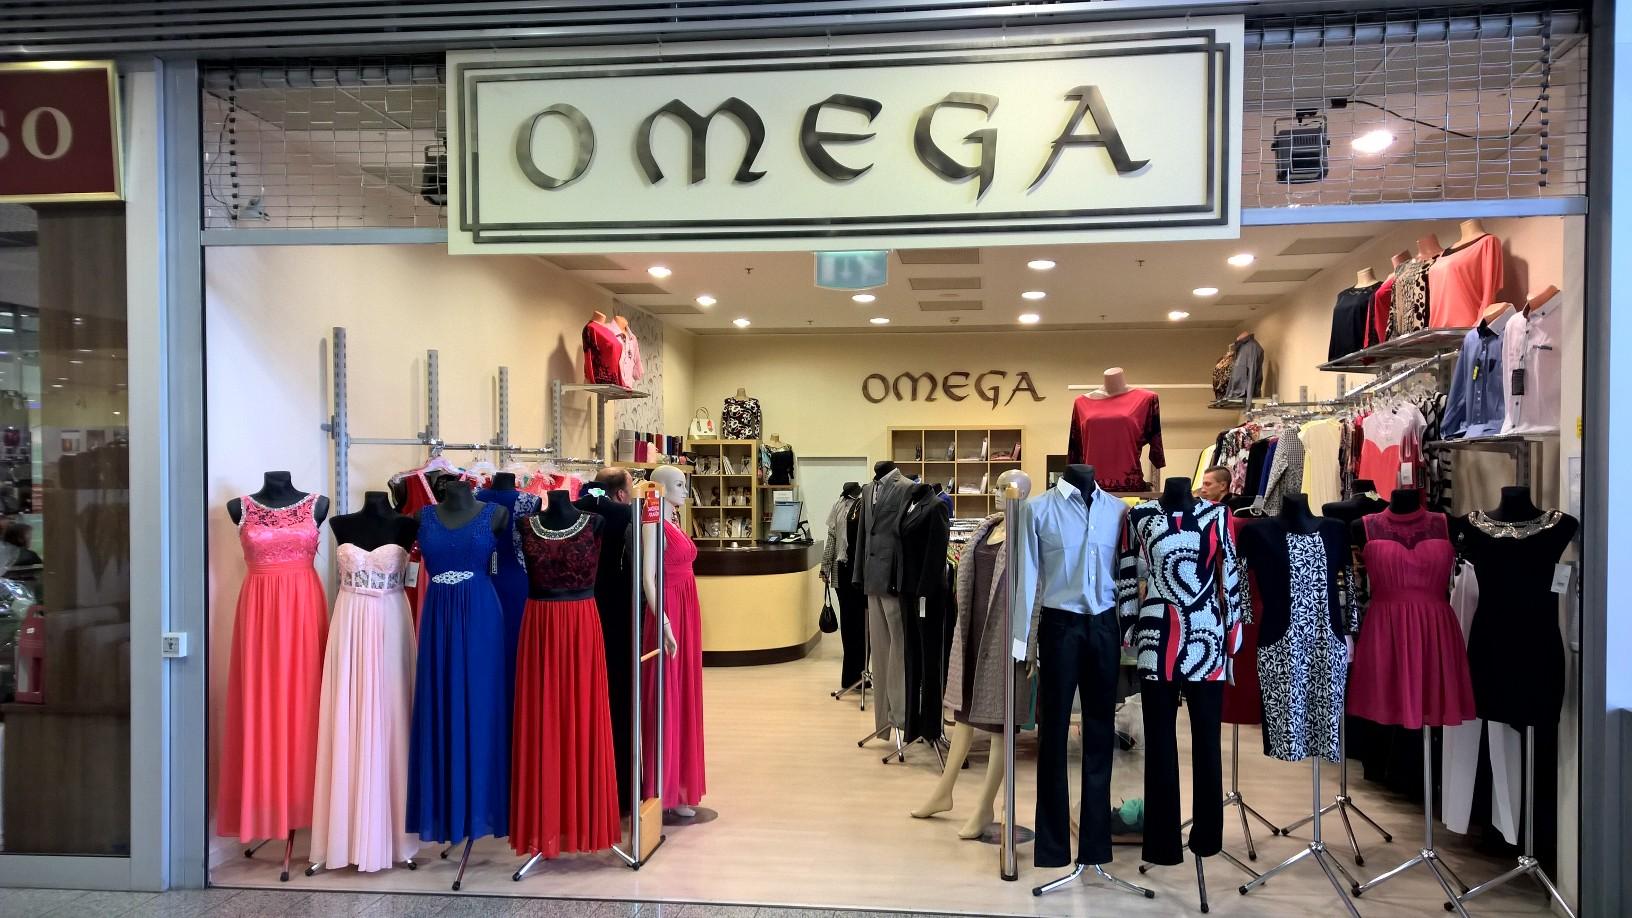 OMEGA - fotografia č. 56b2399bc0c